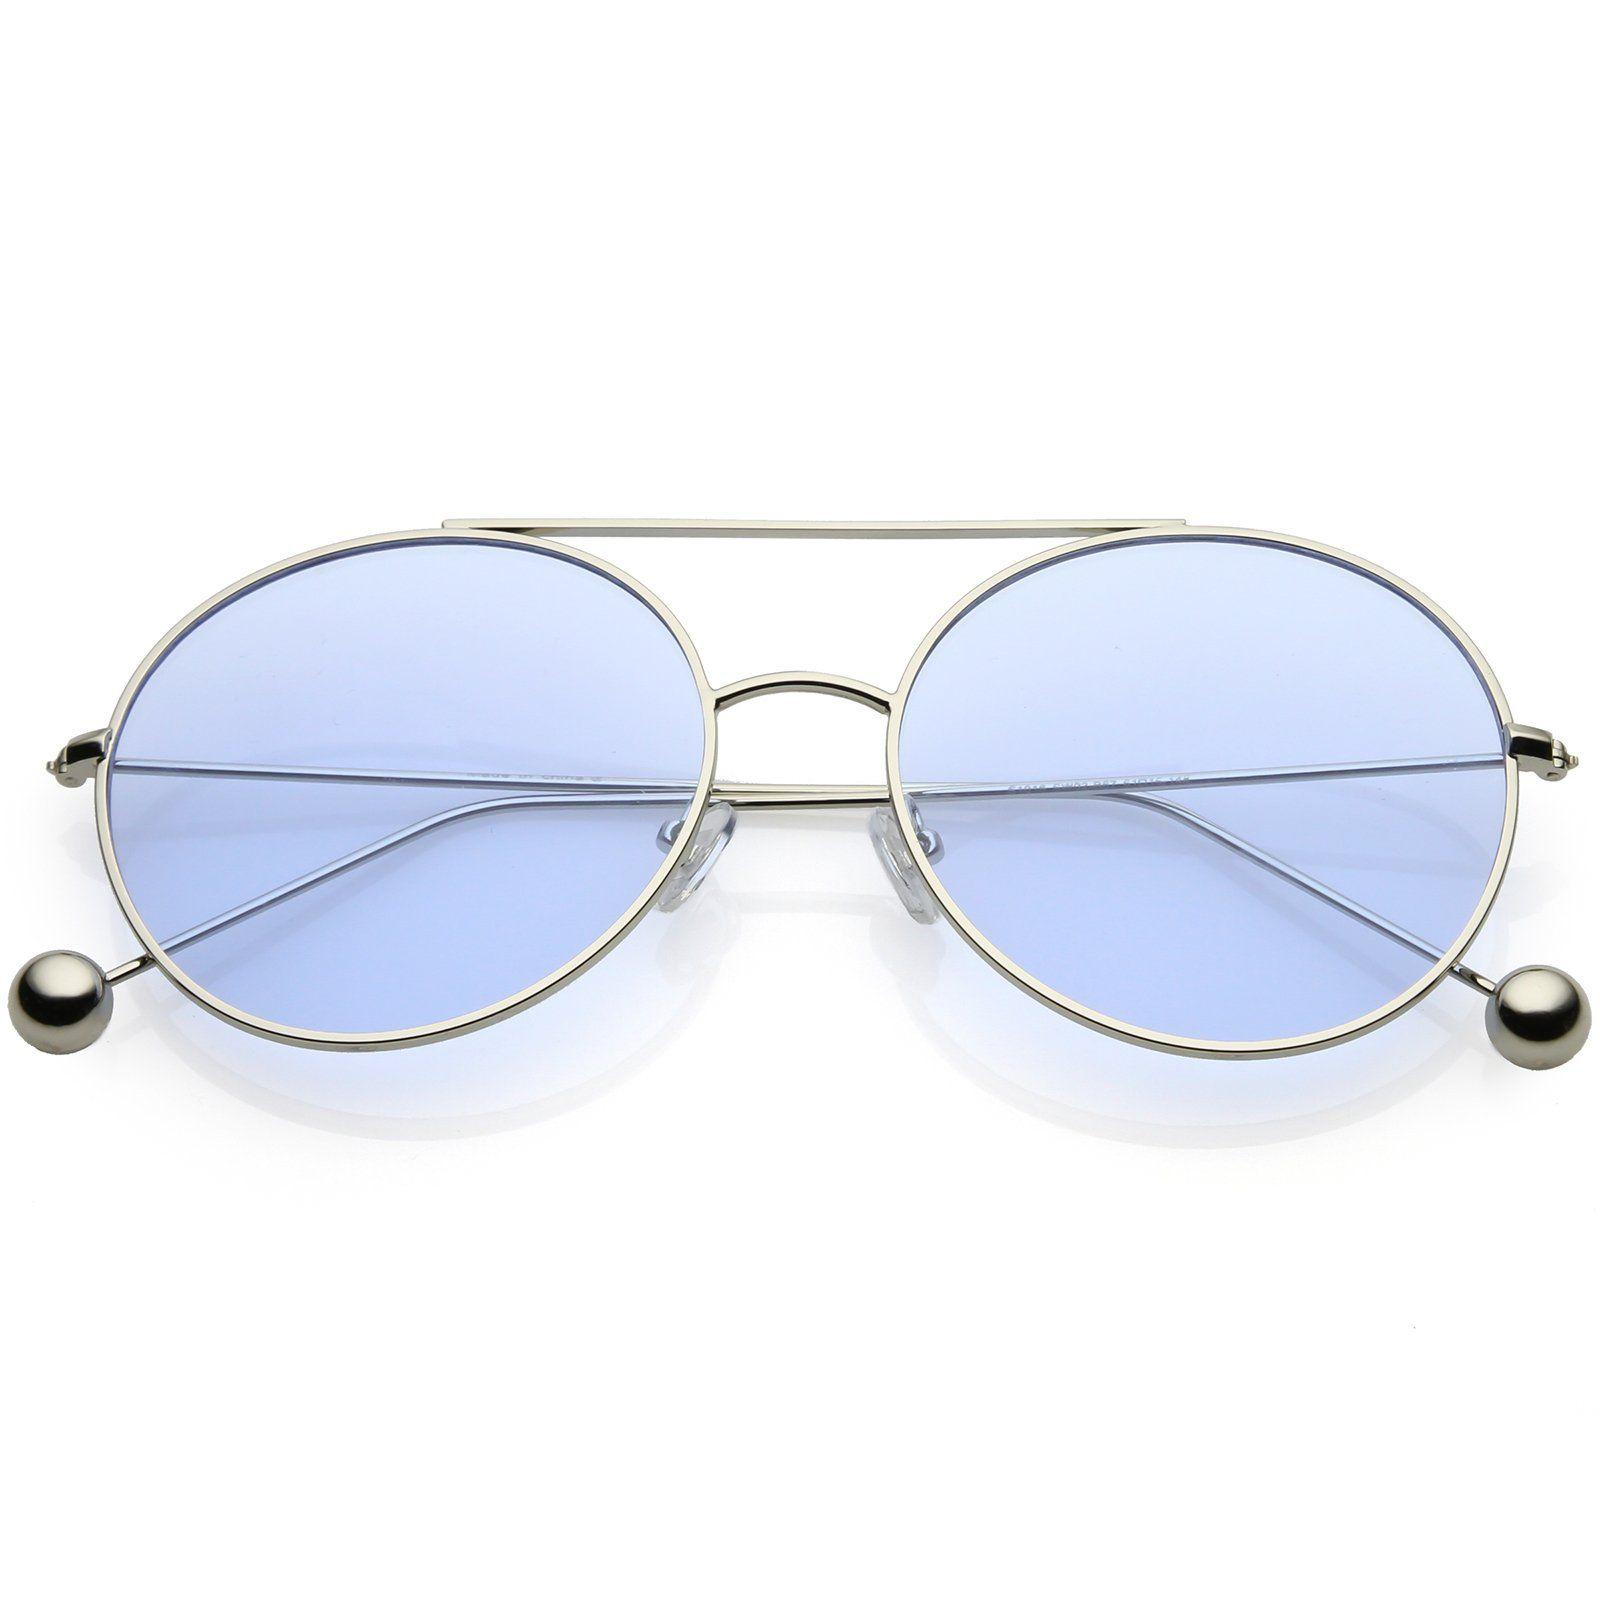 fd48acb047 Premium Oversize Round Sunglasses Metal Double Nose Bridge Color Flat Lens  59mm  frame  sunglasses  sunglass  sunglassla  mirrored  womens  oversized   bold ...